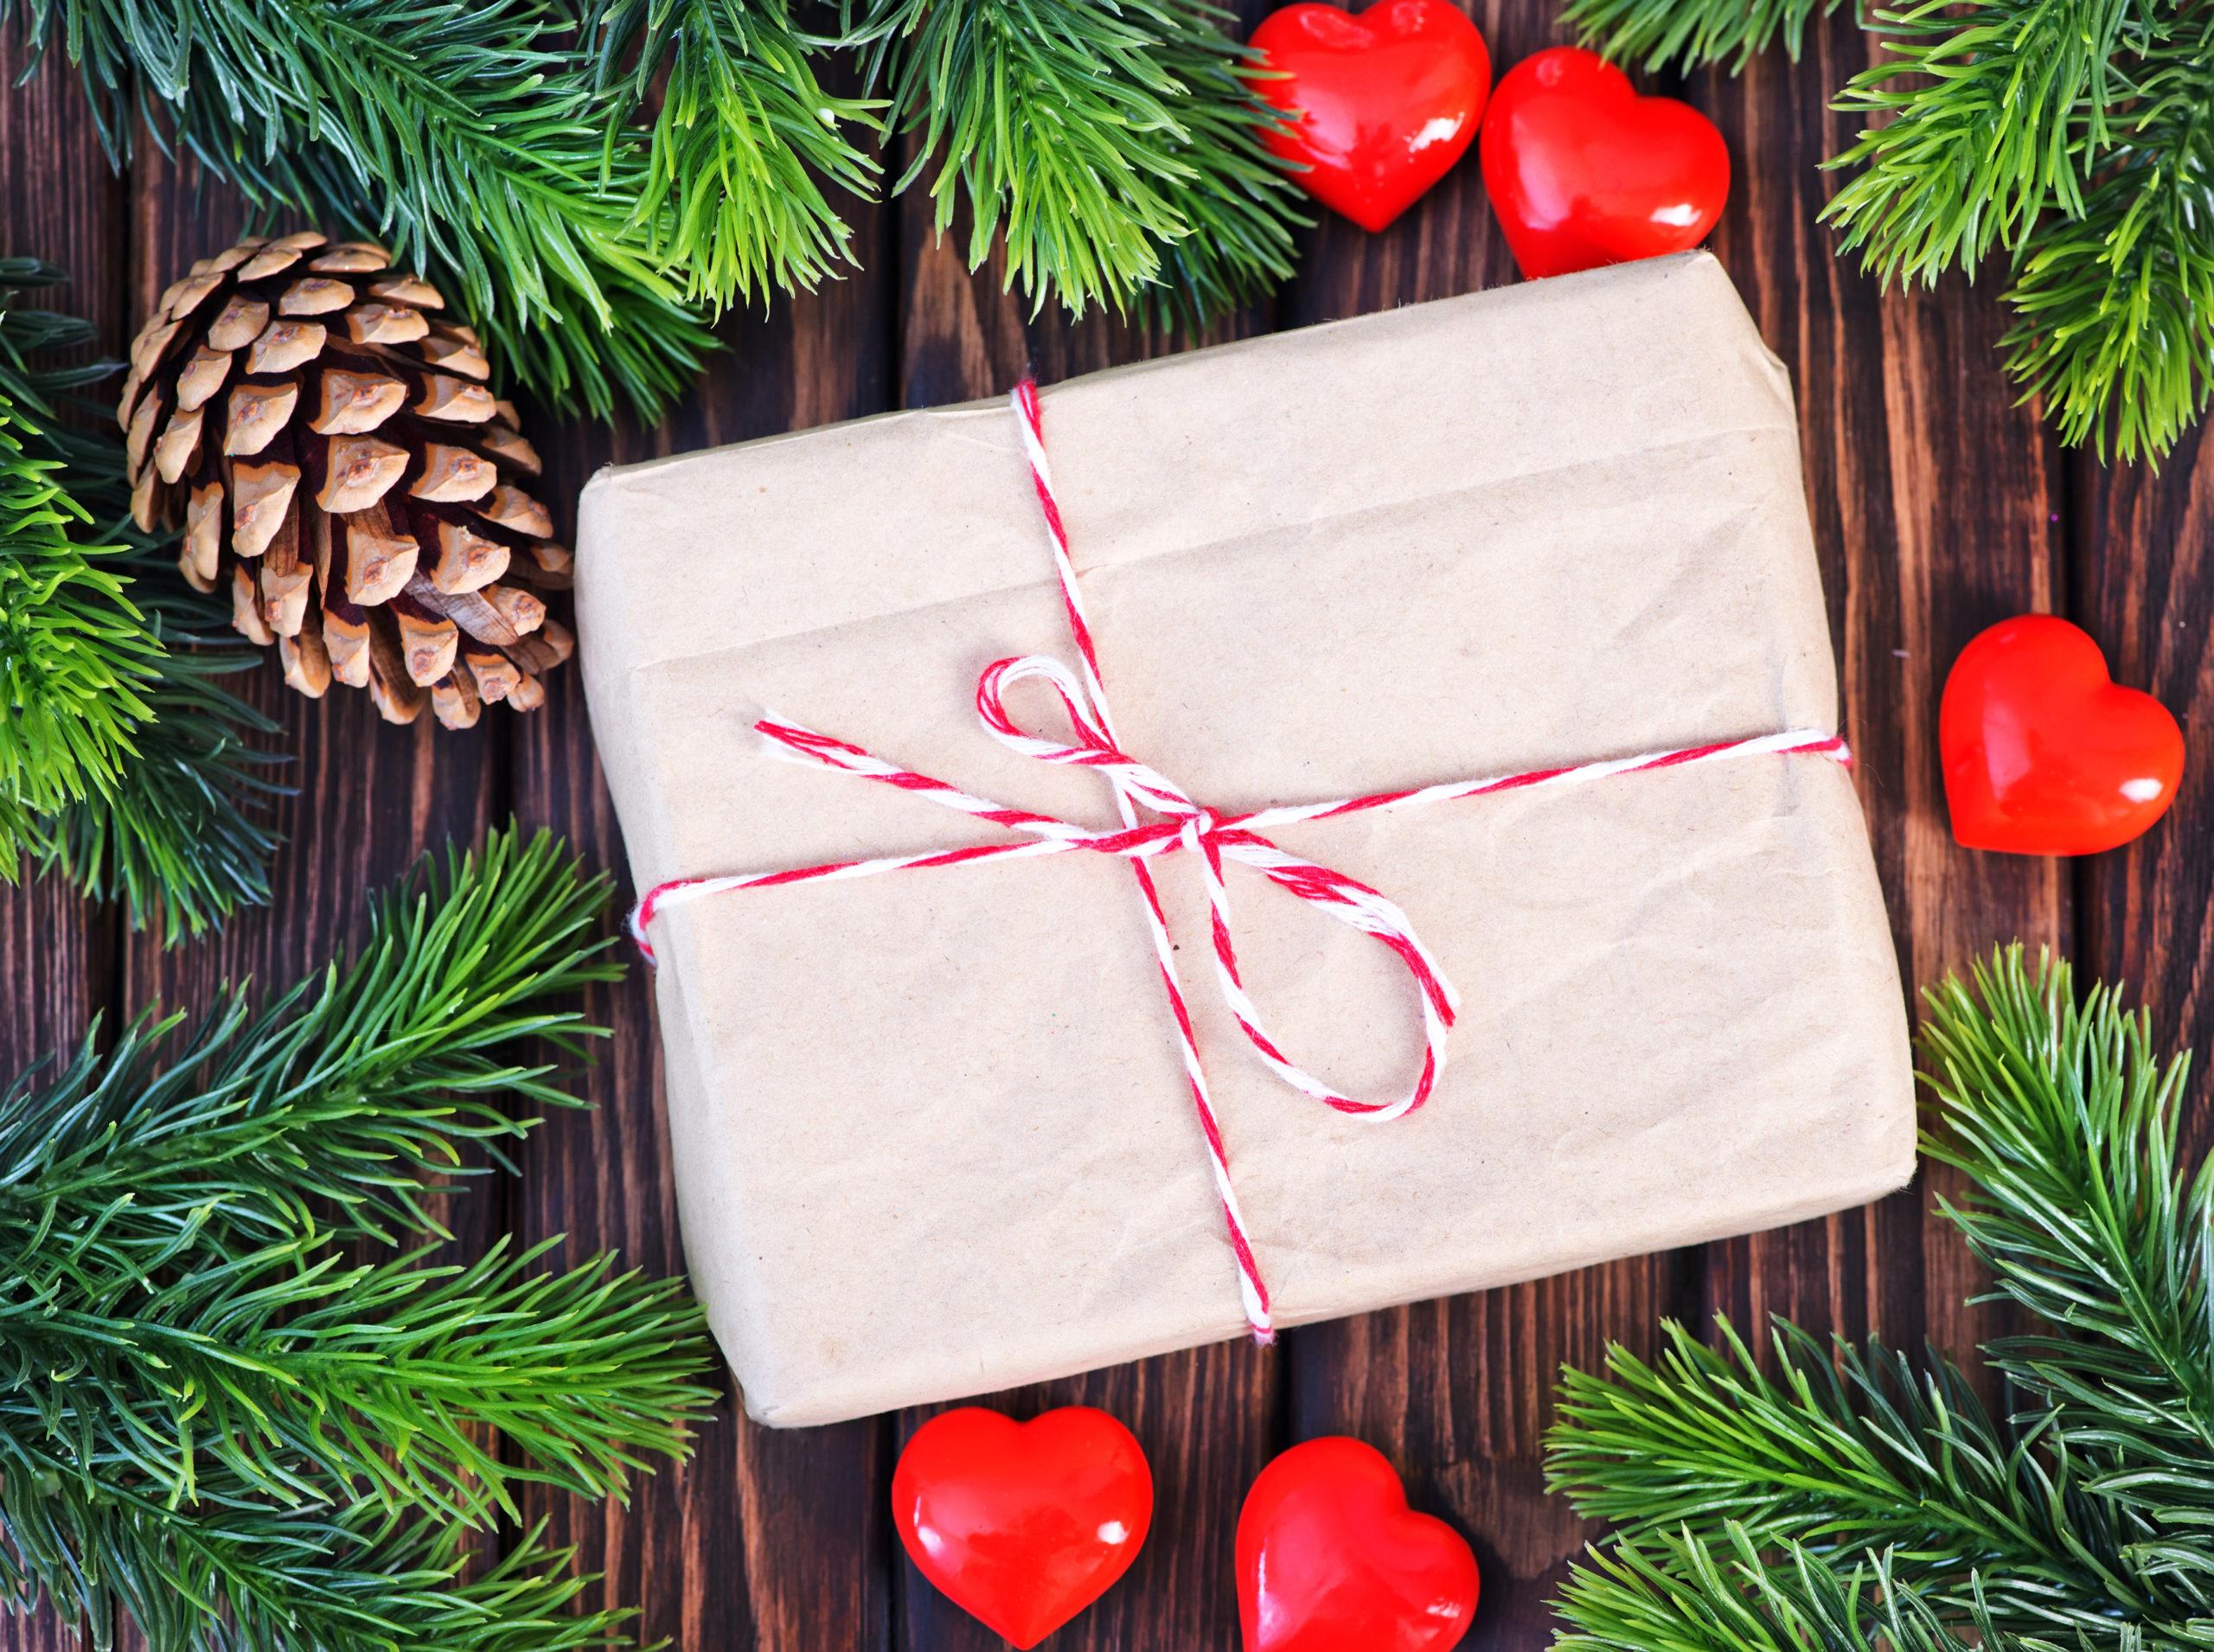 holiday-gift-image